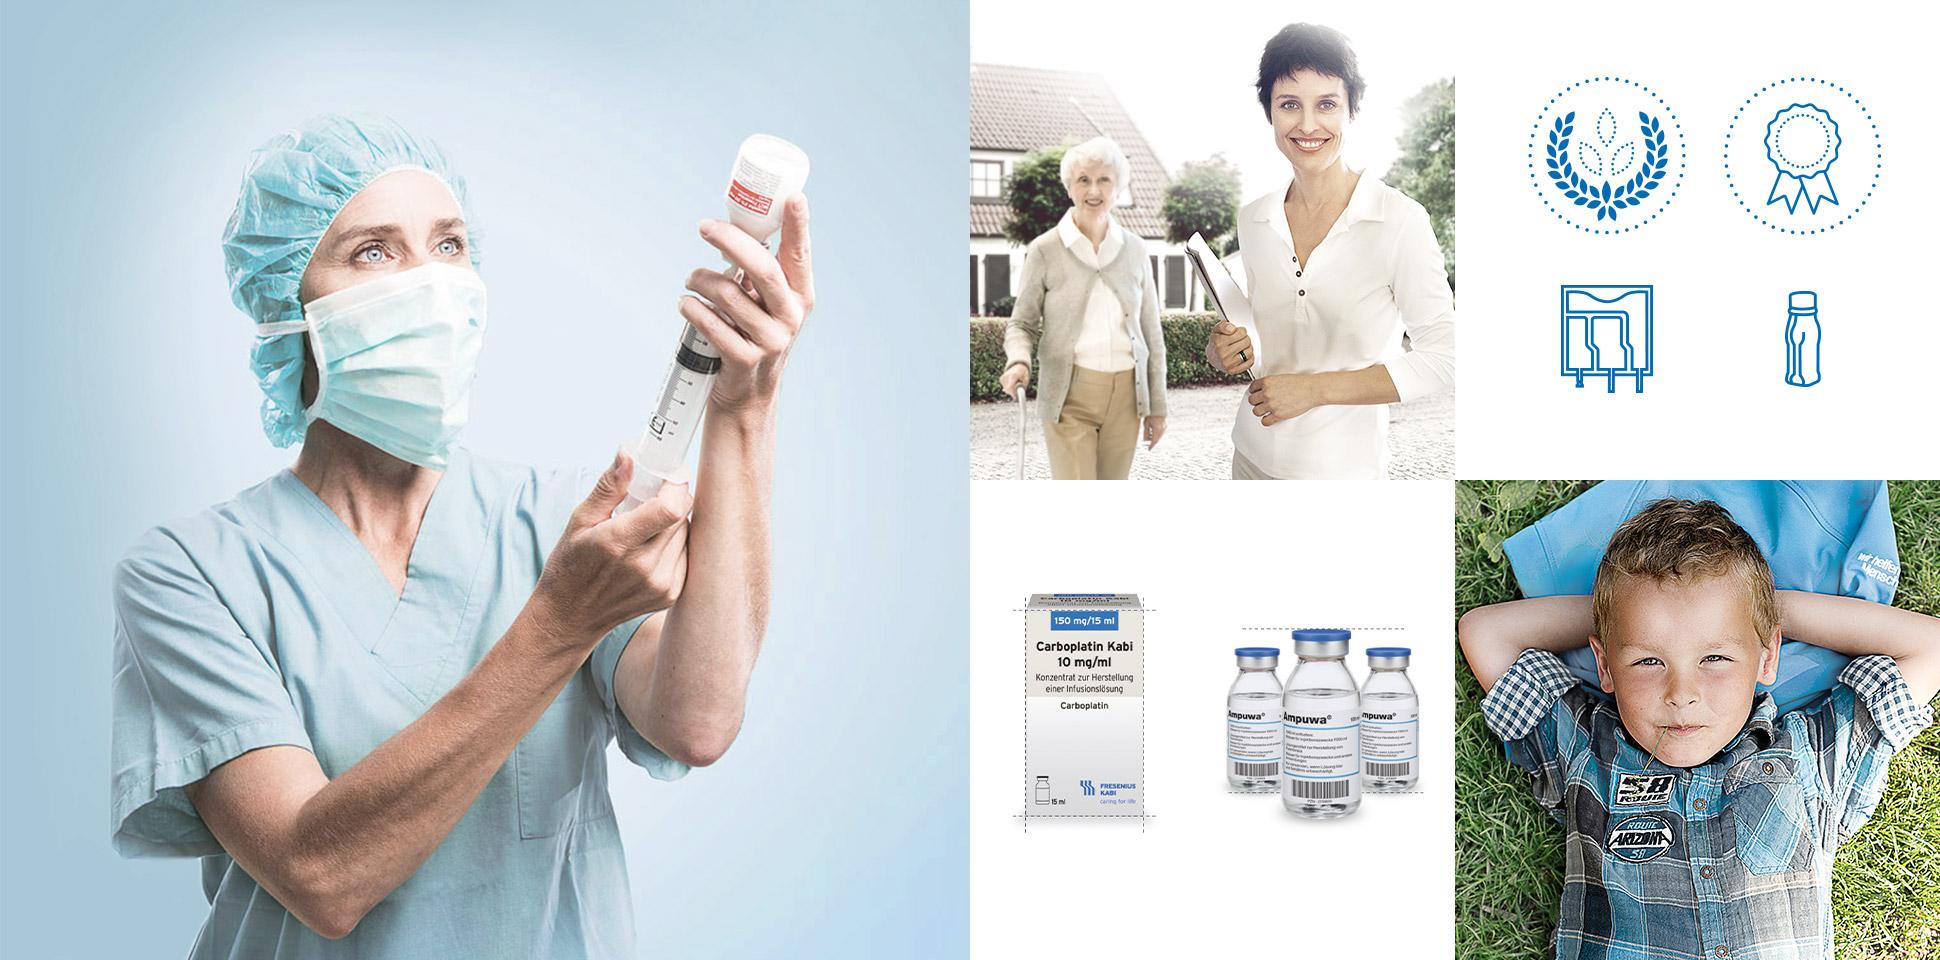 fresenius-kabi corporate-identity mehrere-menschen medikamente polarwerk